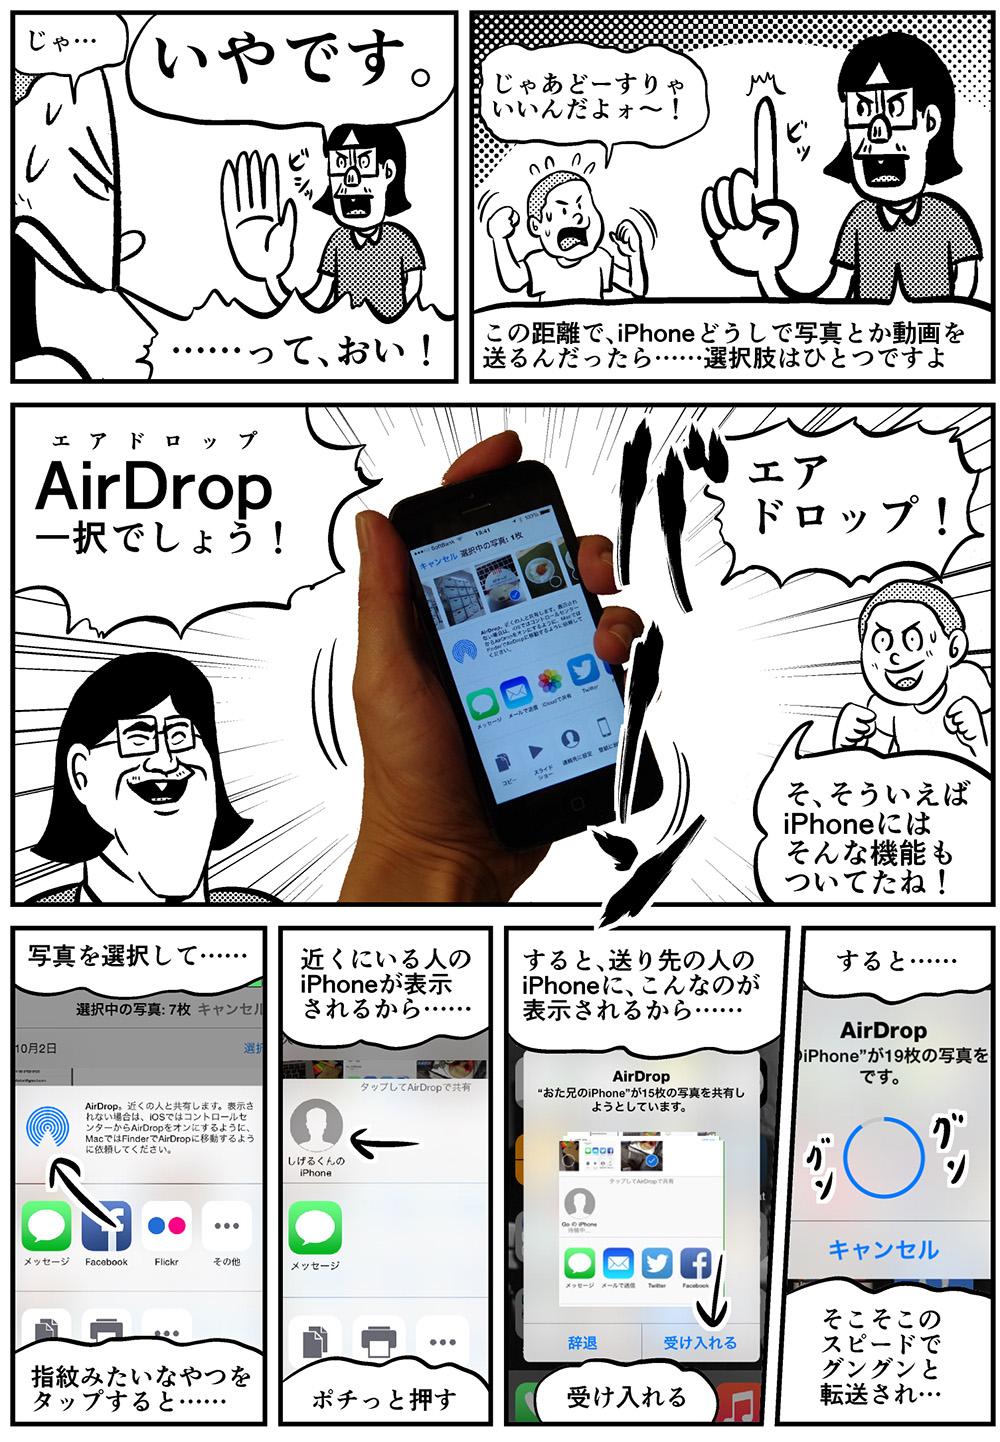 otani-airdrop0002